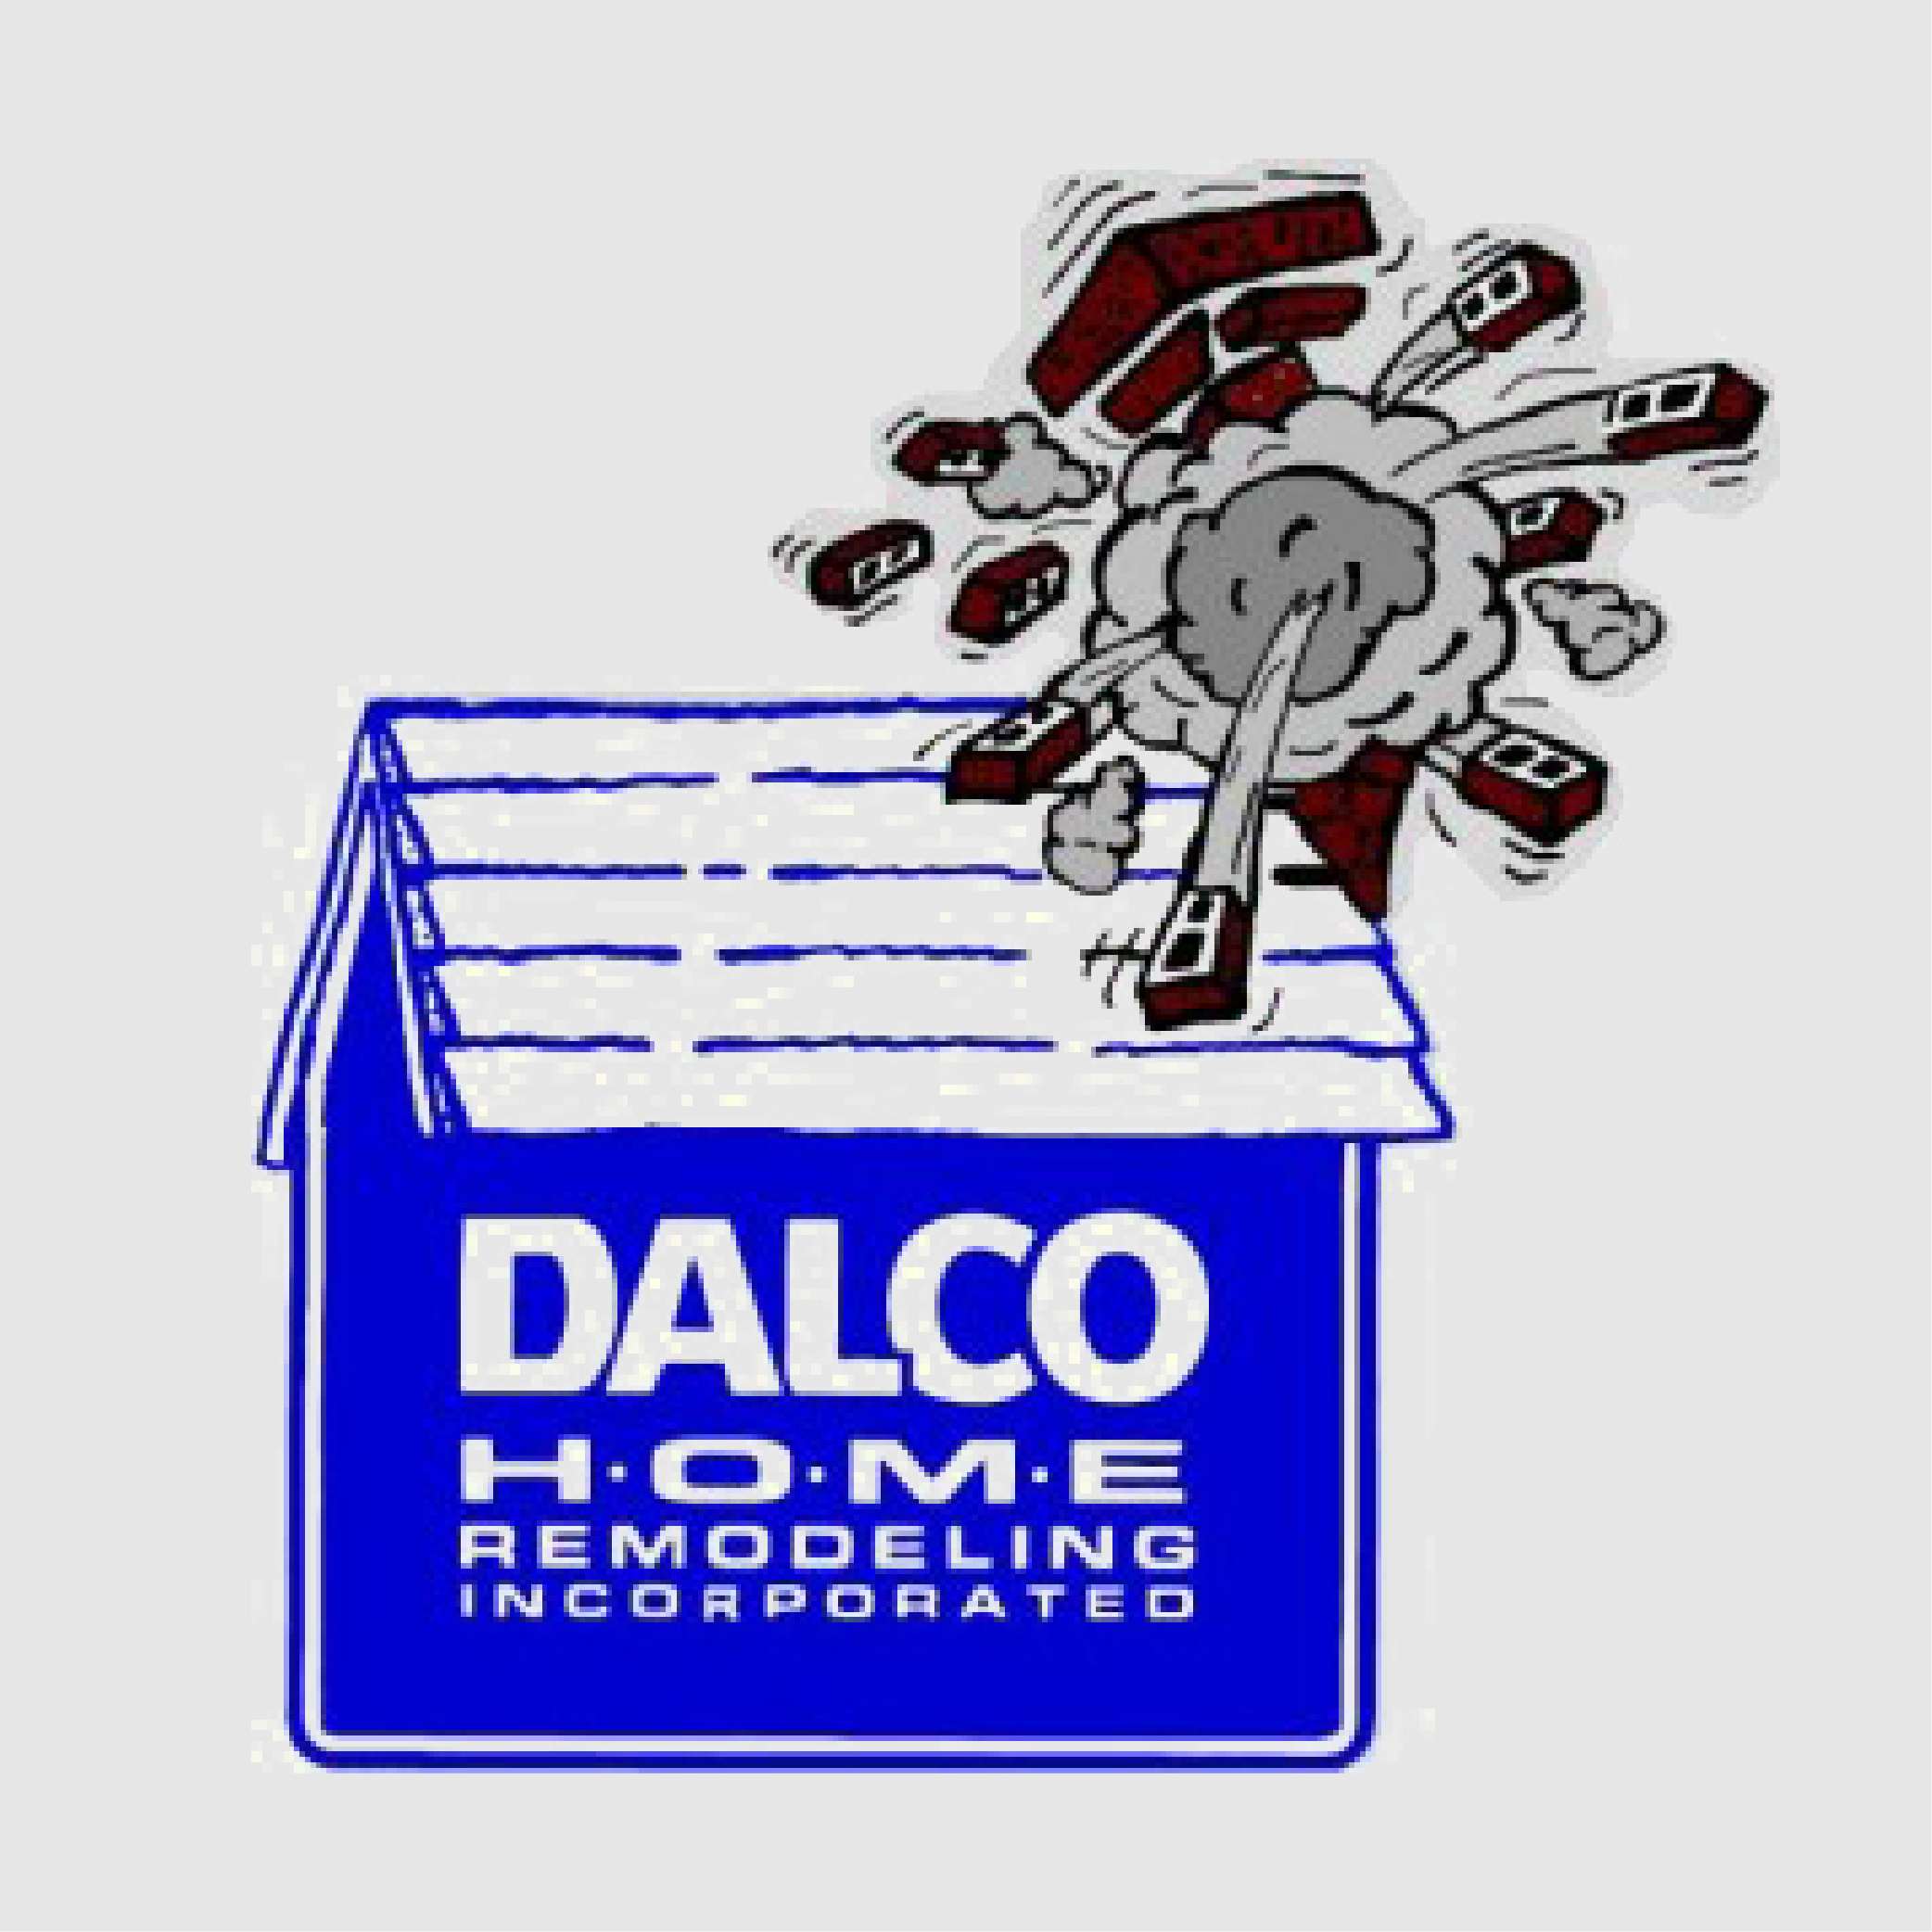 Dalco Home Remodeling, Inc.    Wayne Kaufman    13795 Saint Charles Rock Rd.    Bridgeton, MO 63044    (314) 298-7300    wayworld11@gmail.com    http://dalcohomeremodeling.com/    Member Since: 2013